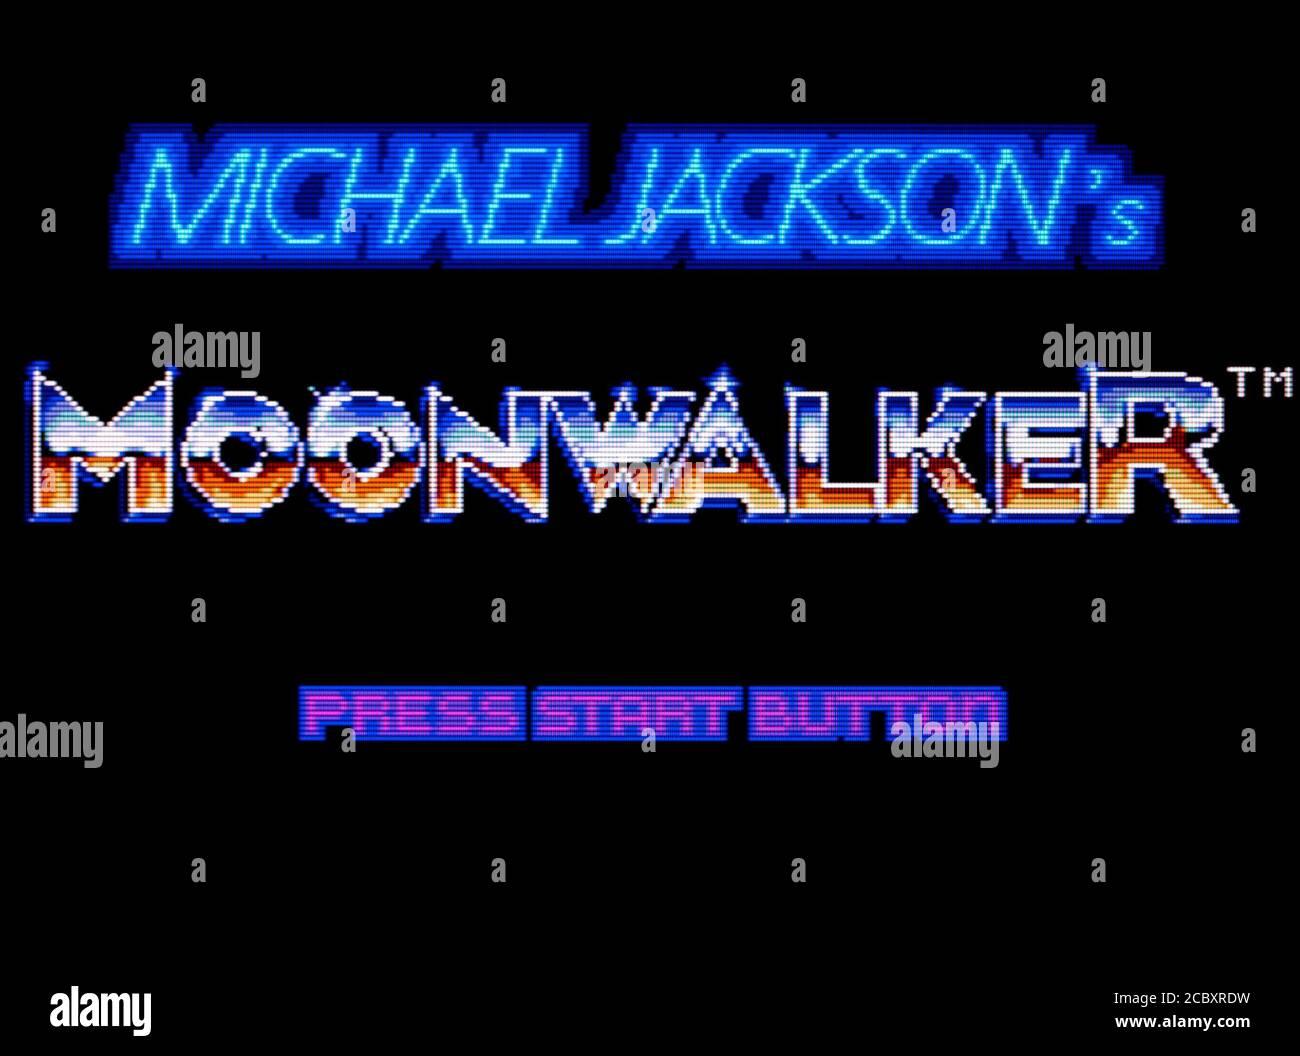 Michael Jackson's Moonwalker - Sega Master System - SMS - editorial use only Stock Photo